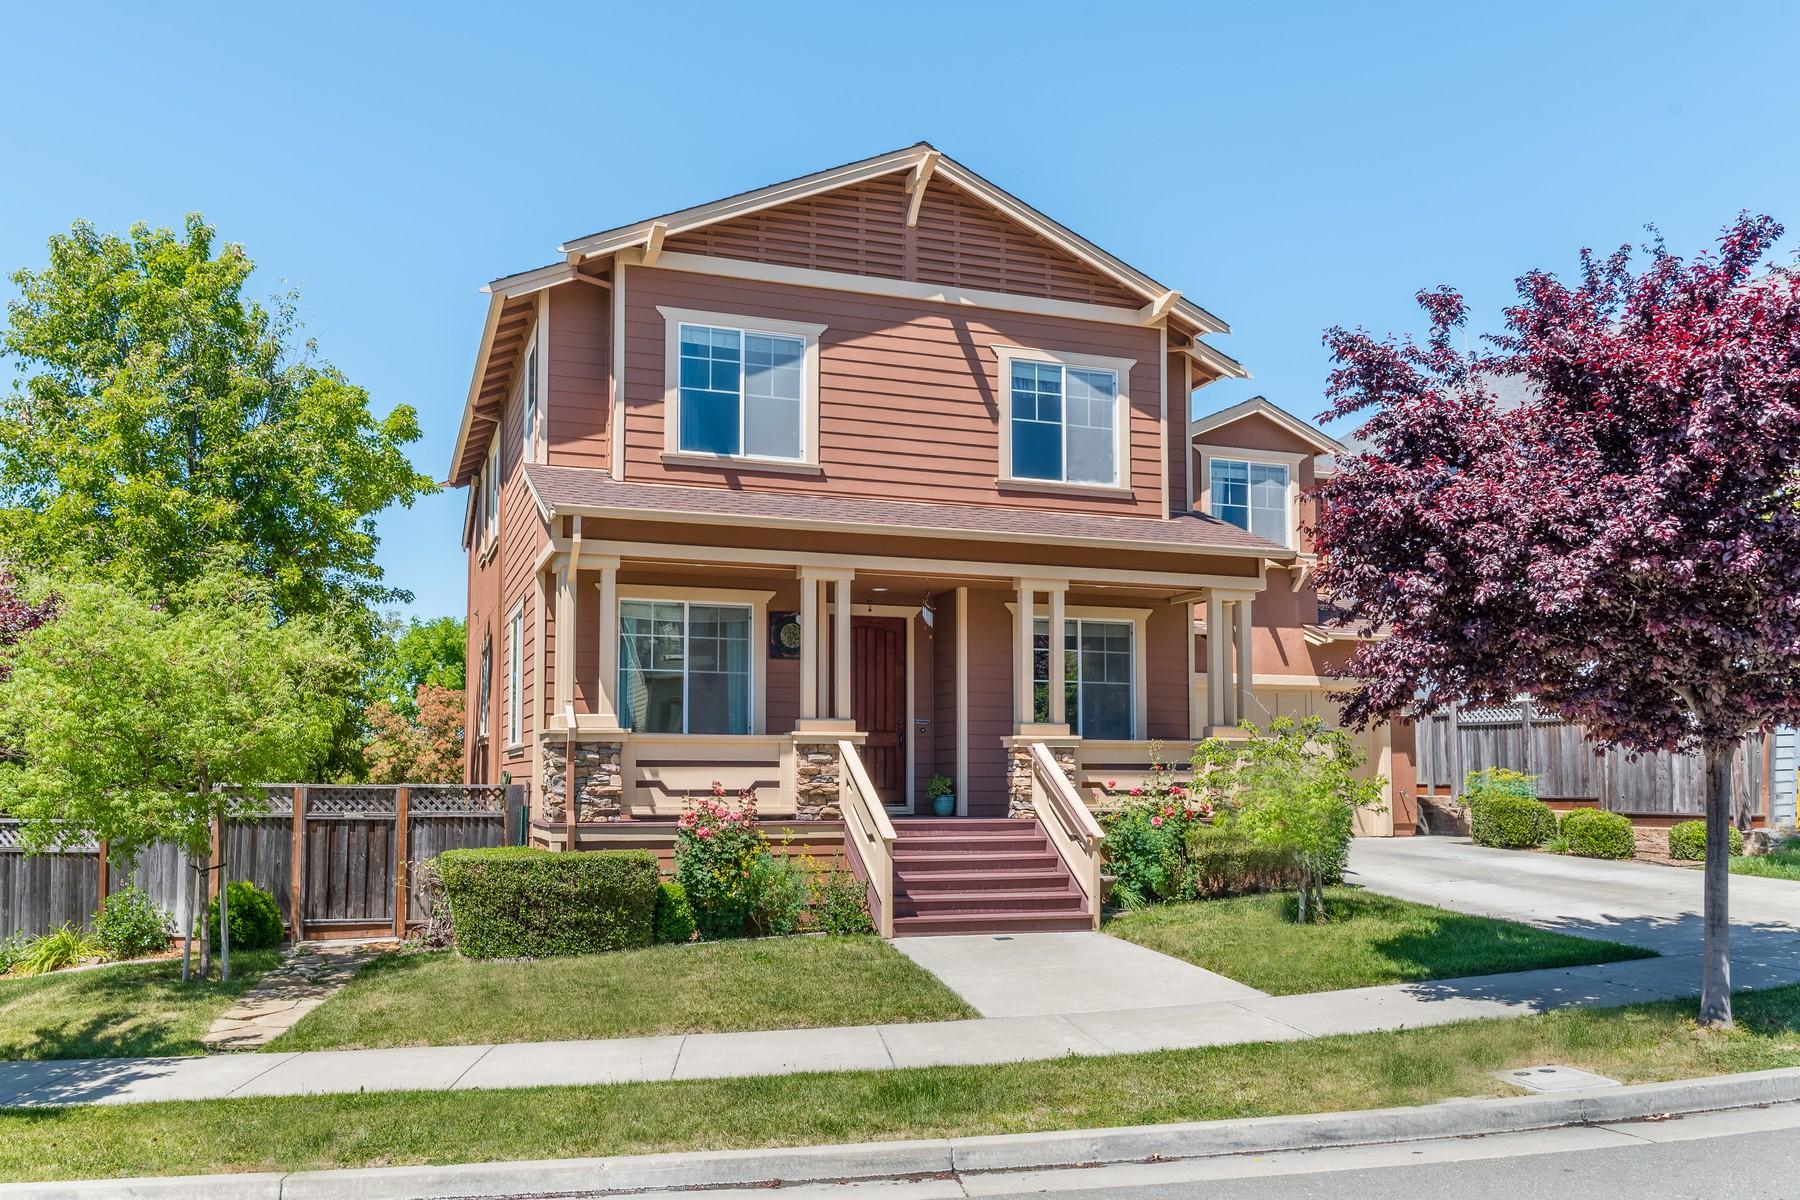 Single Family Home for Sale at 1344 Gordon Lane Santa Rosa, California, 95404 United States